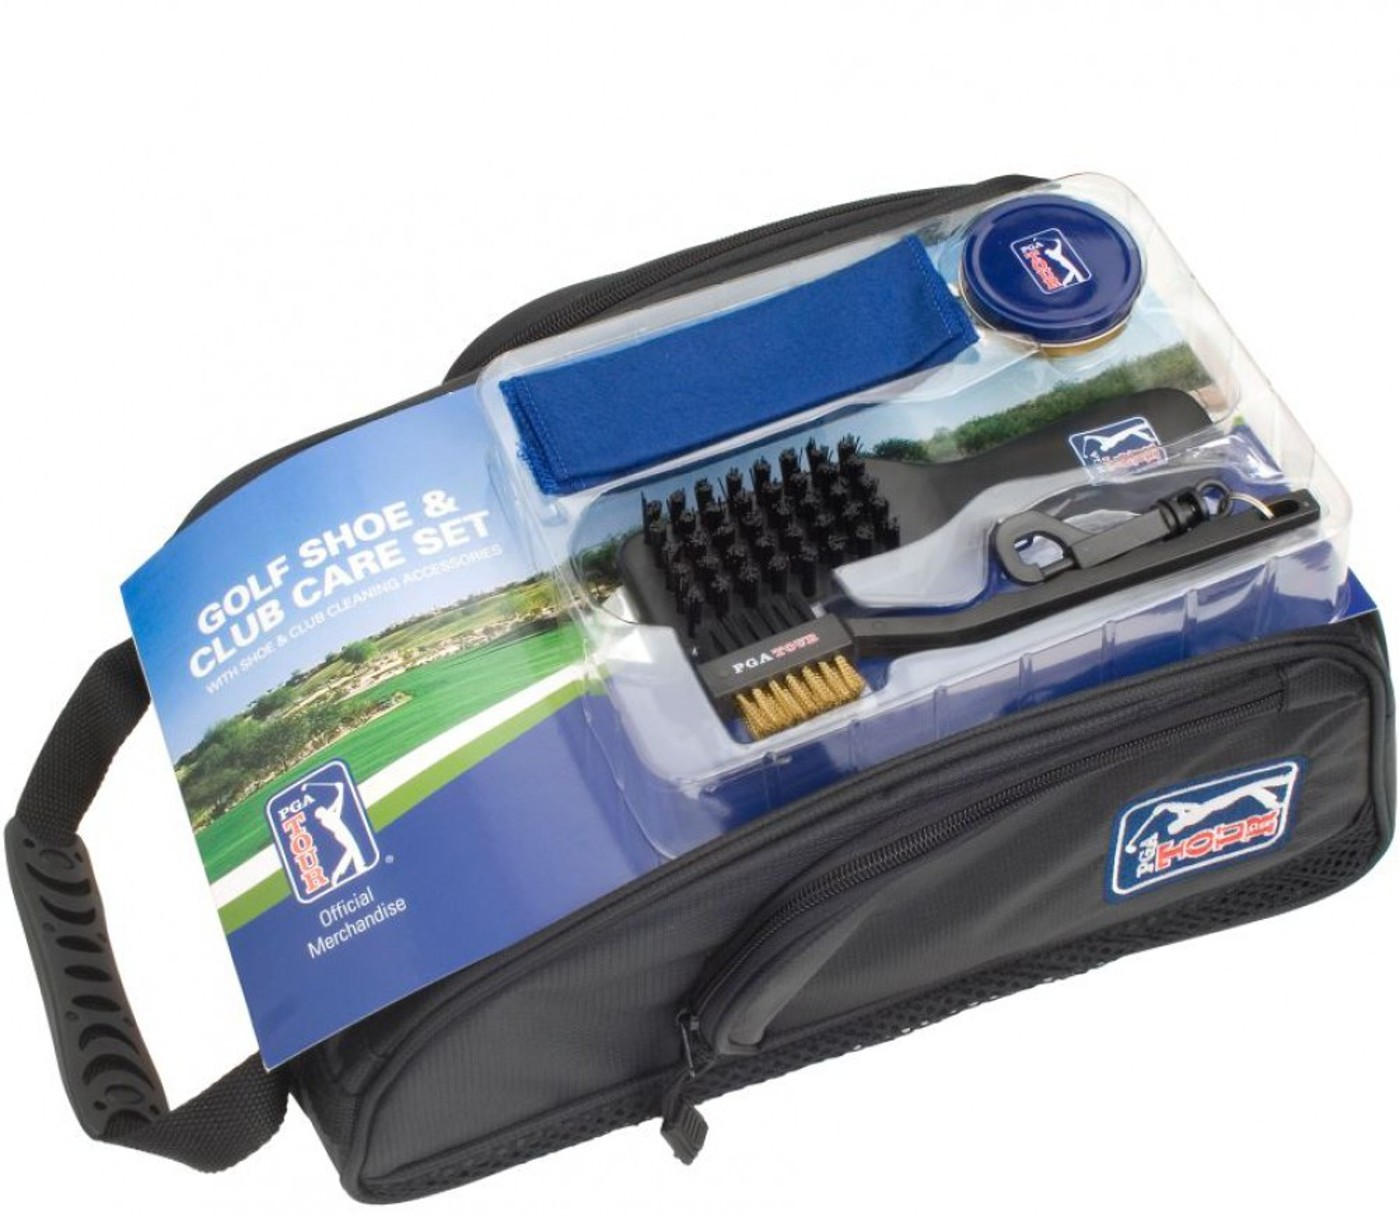 PGA TOUR Golf Shoe Bag and Clu